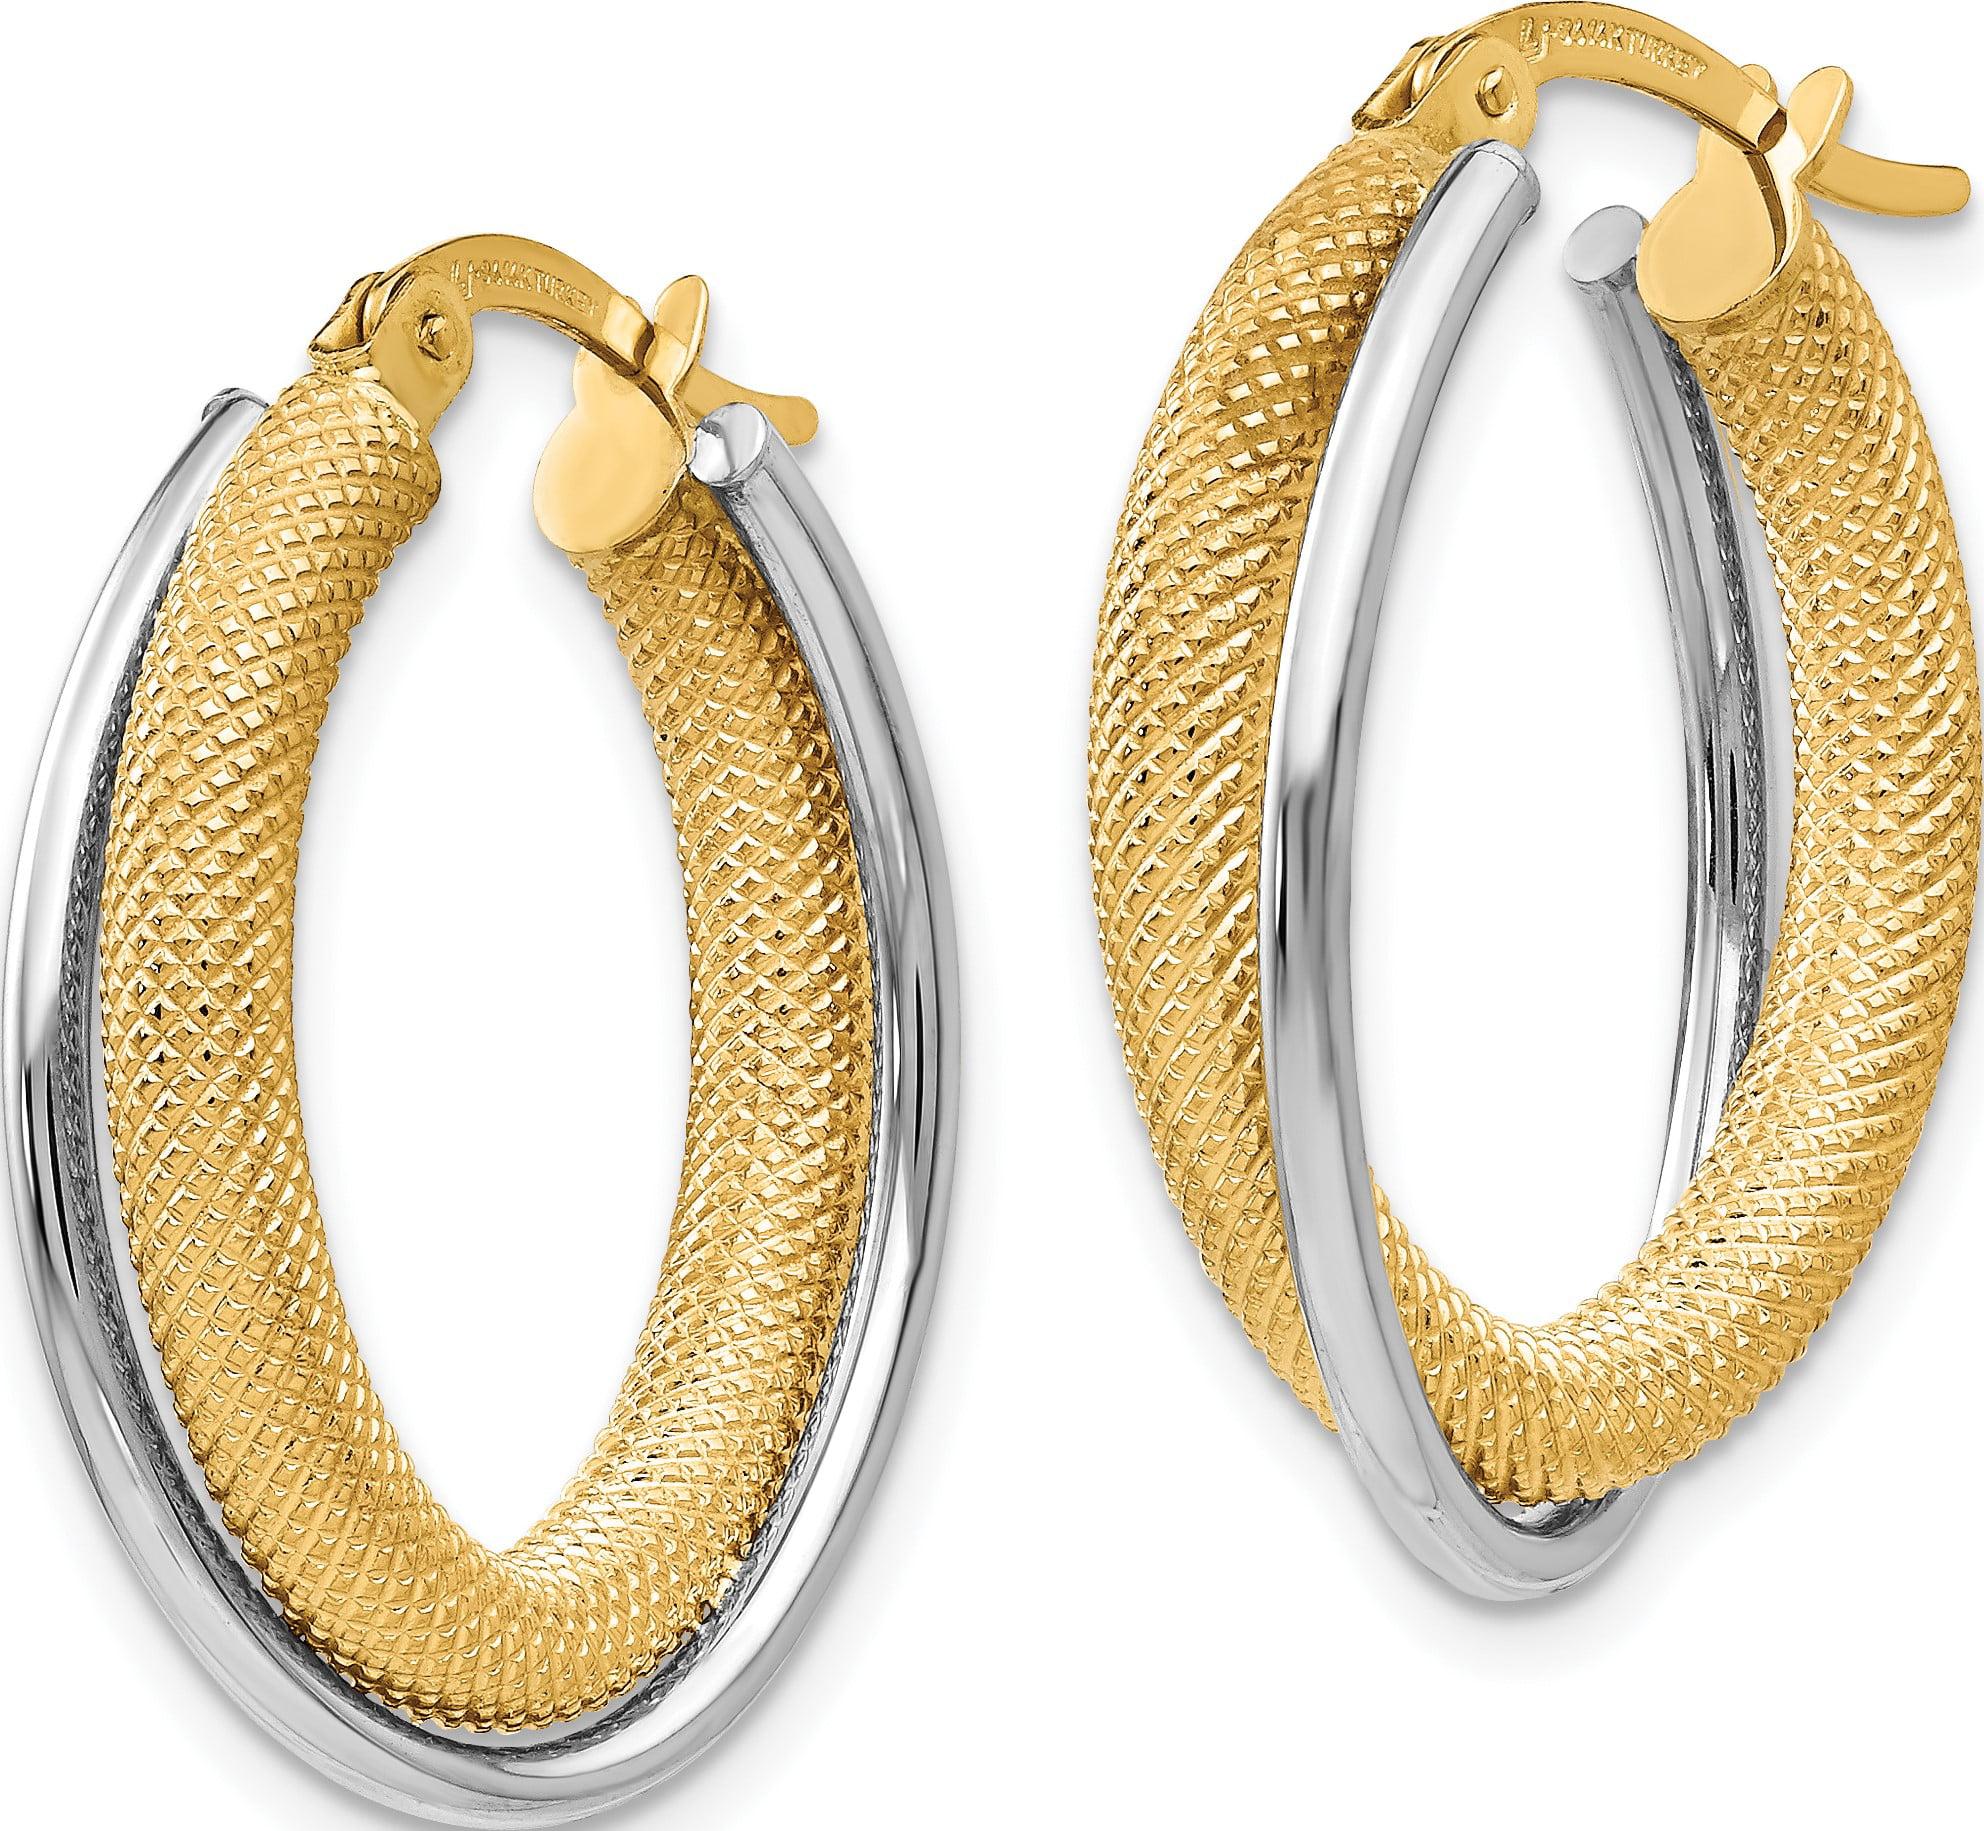 Leslie's 14K Two-tone Polished & Textured Hoop Earrings - image 1 de 3